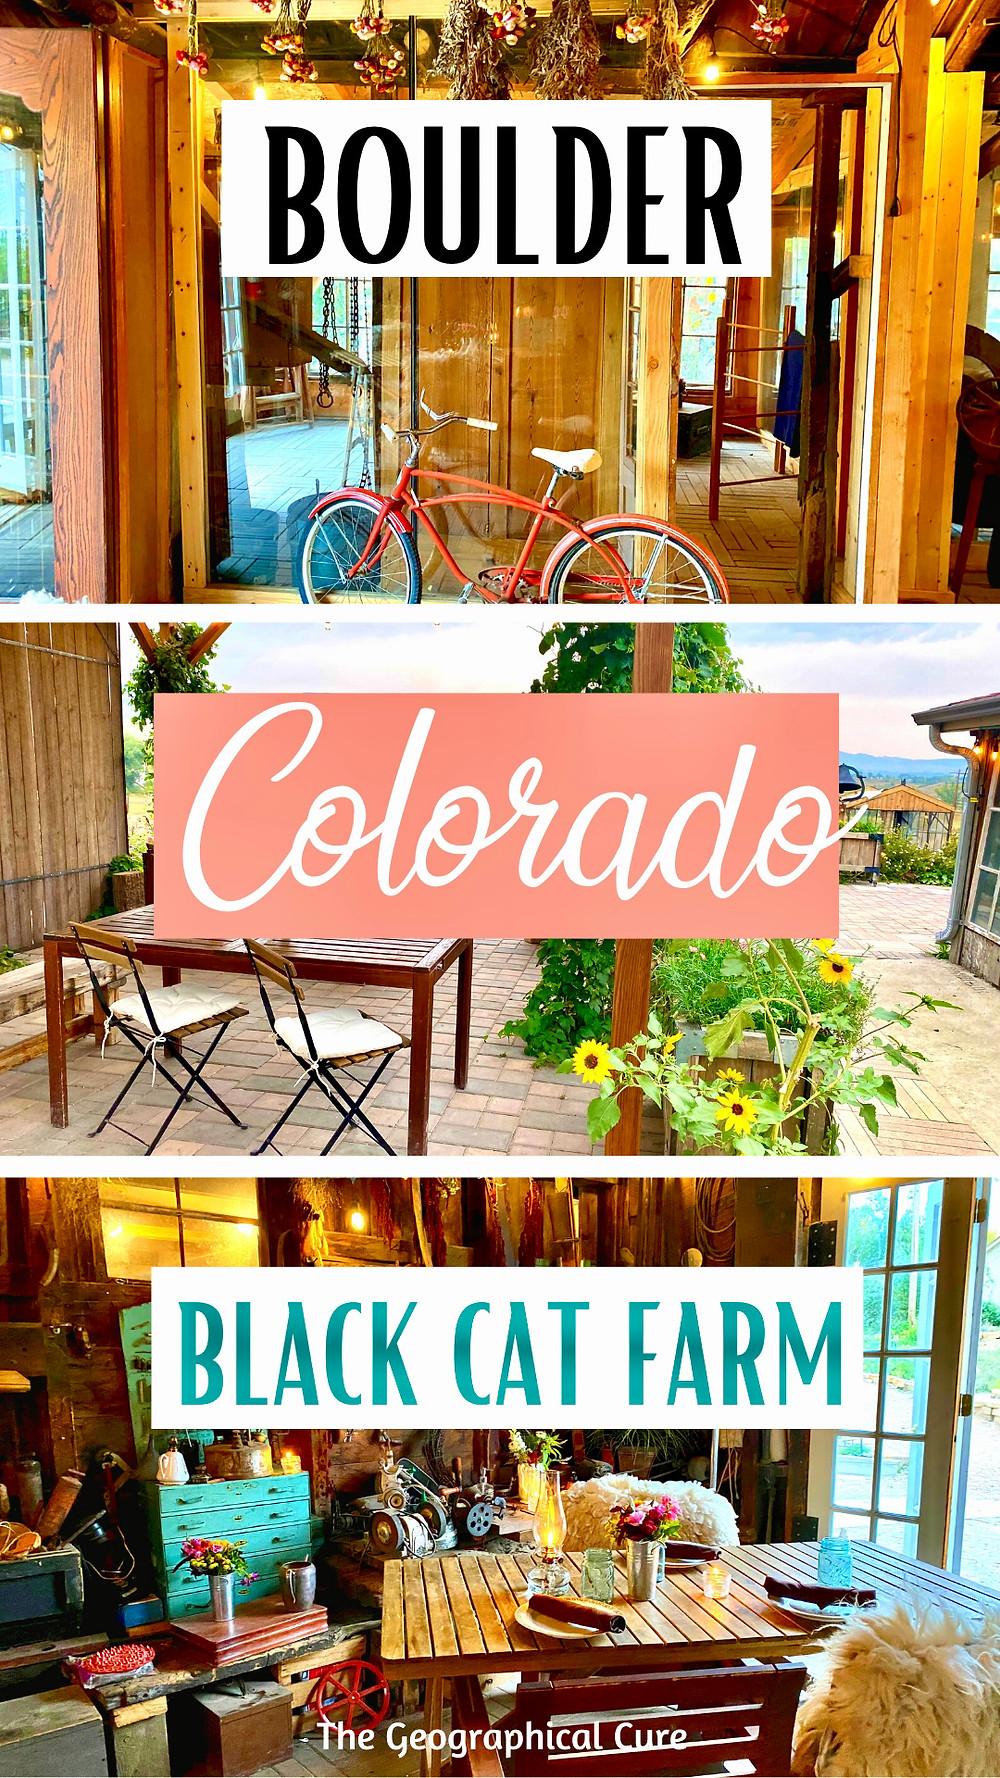 review of Black Cat Farm Dinners, Boulder's best restaurant